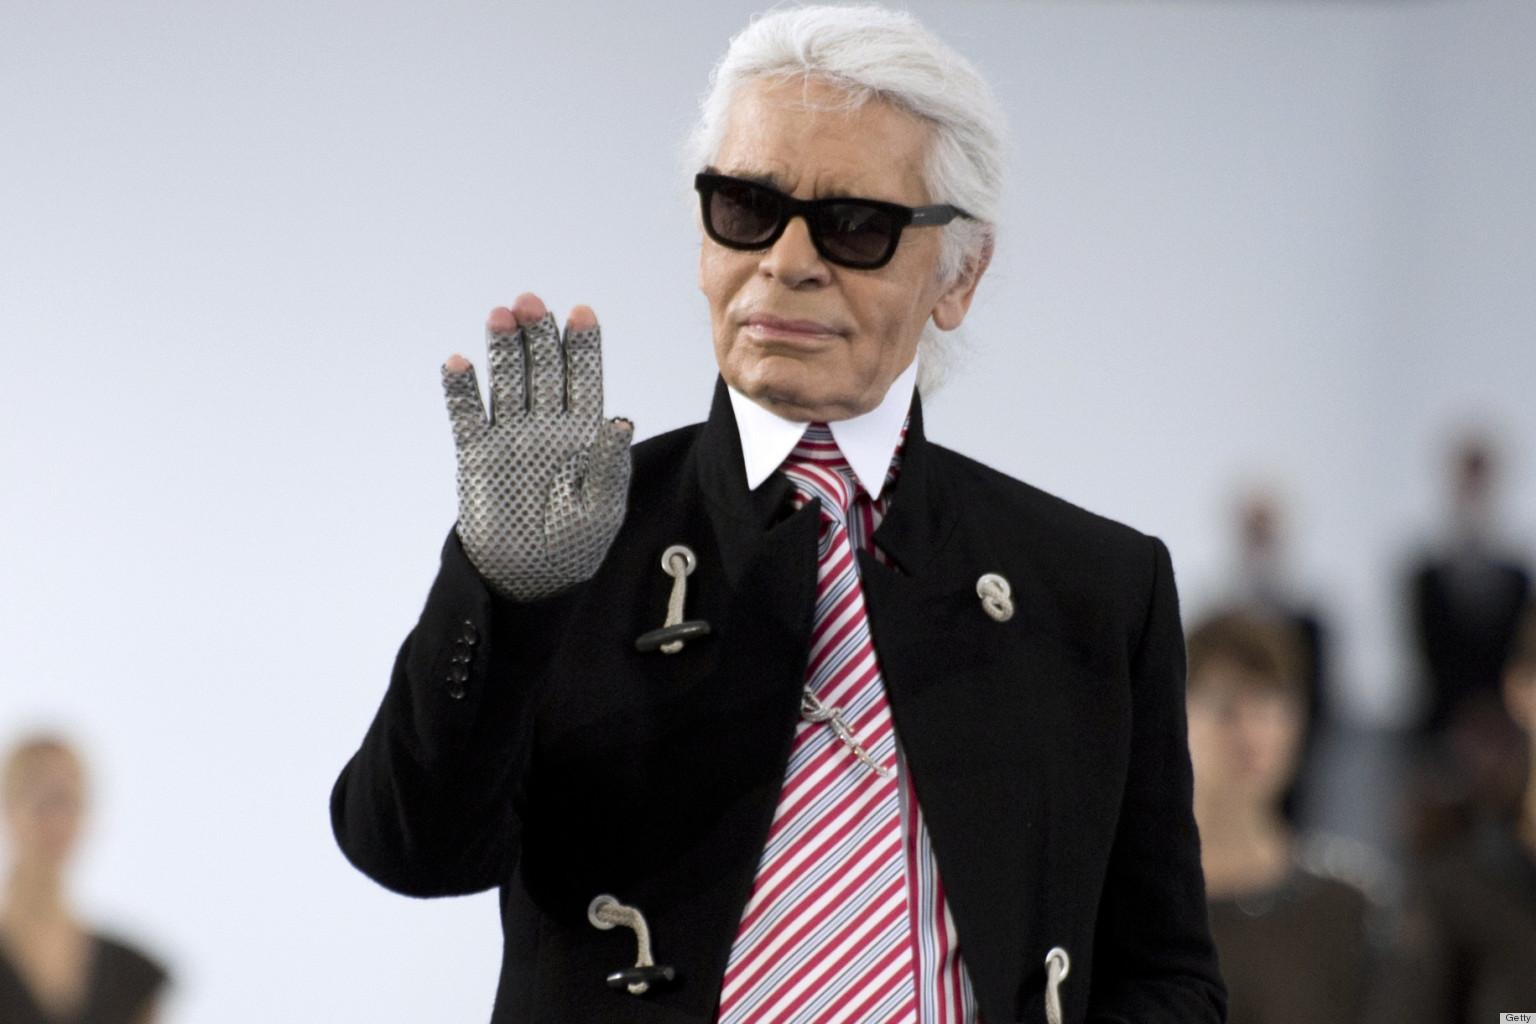 Nigerian Fashion Designers Mourn Karl Lagerfeld